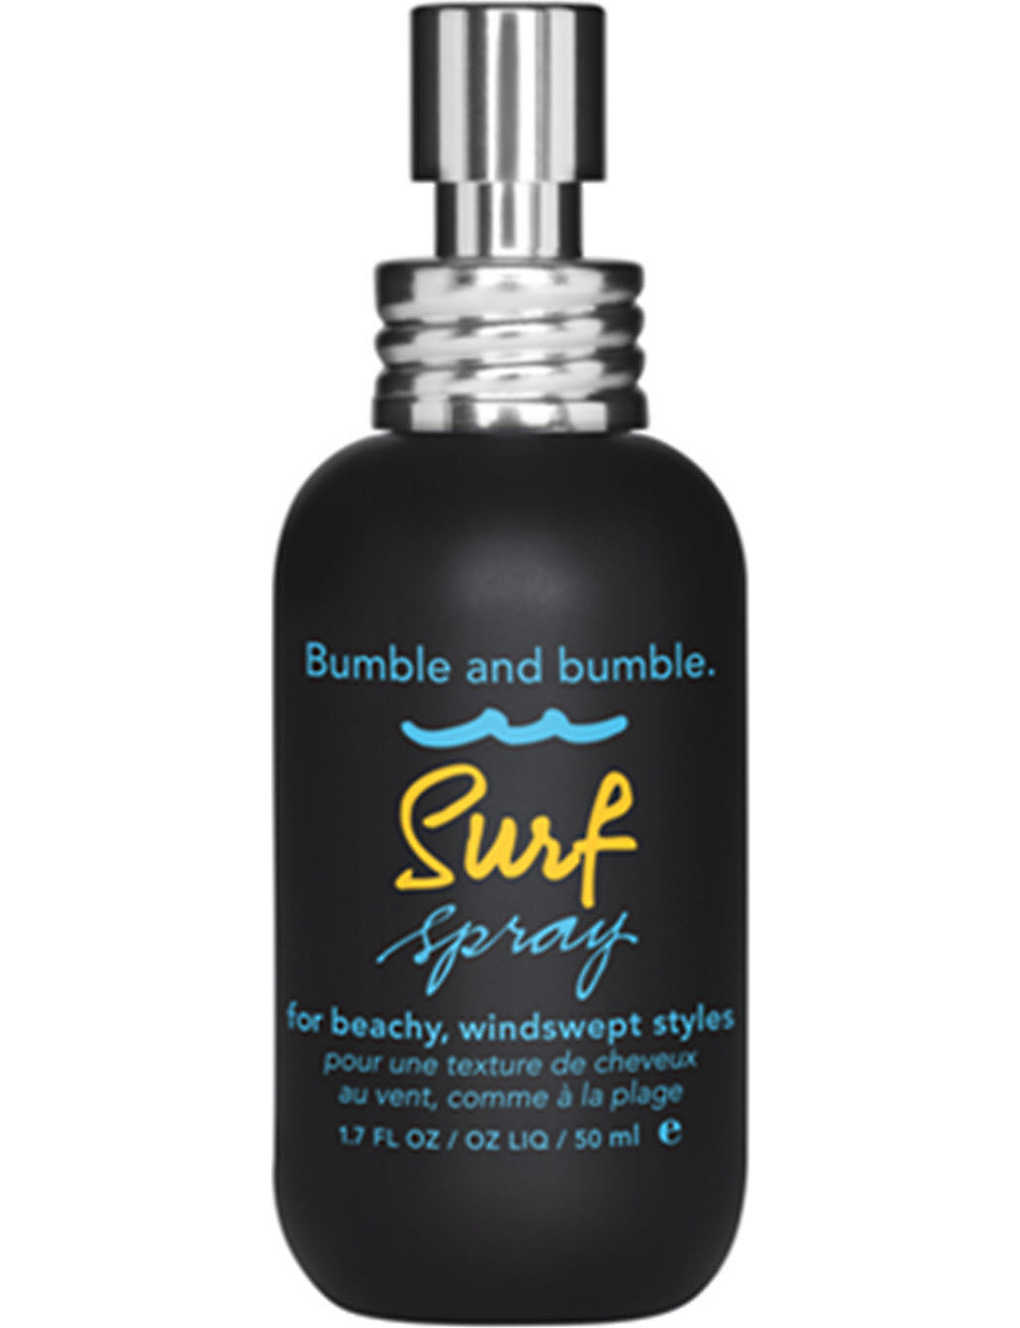 Bumble And Bumble Surf Spray Mini 1.7 oz/ 50 ml